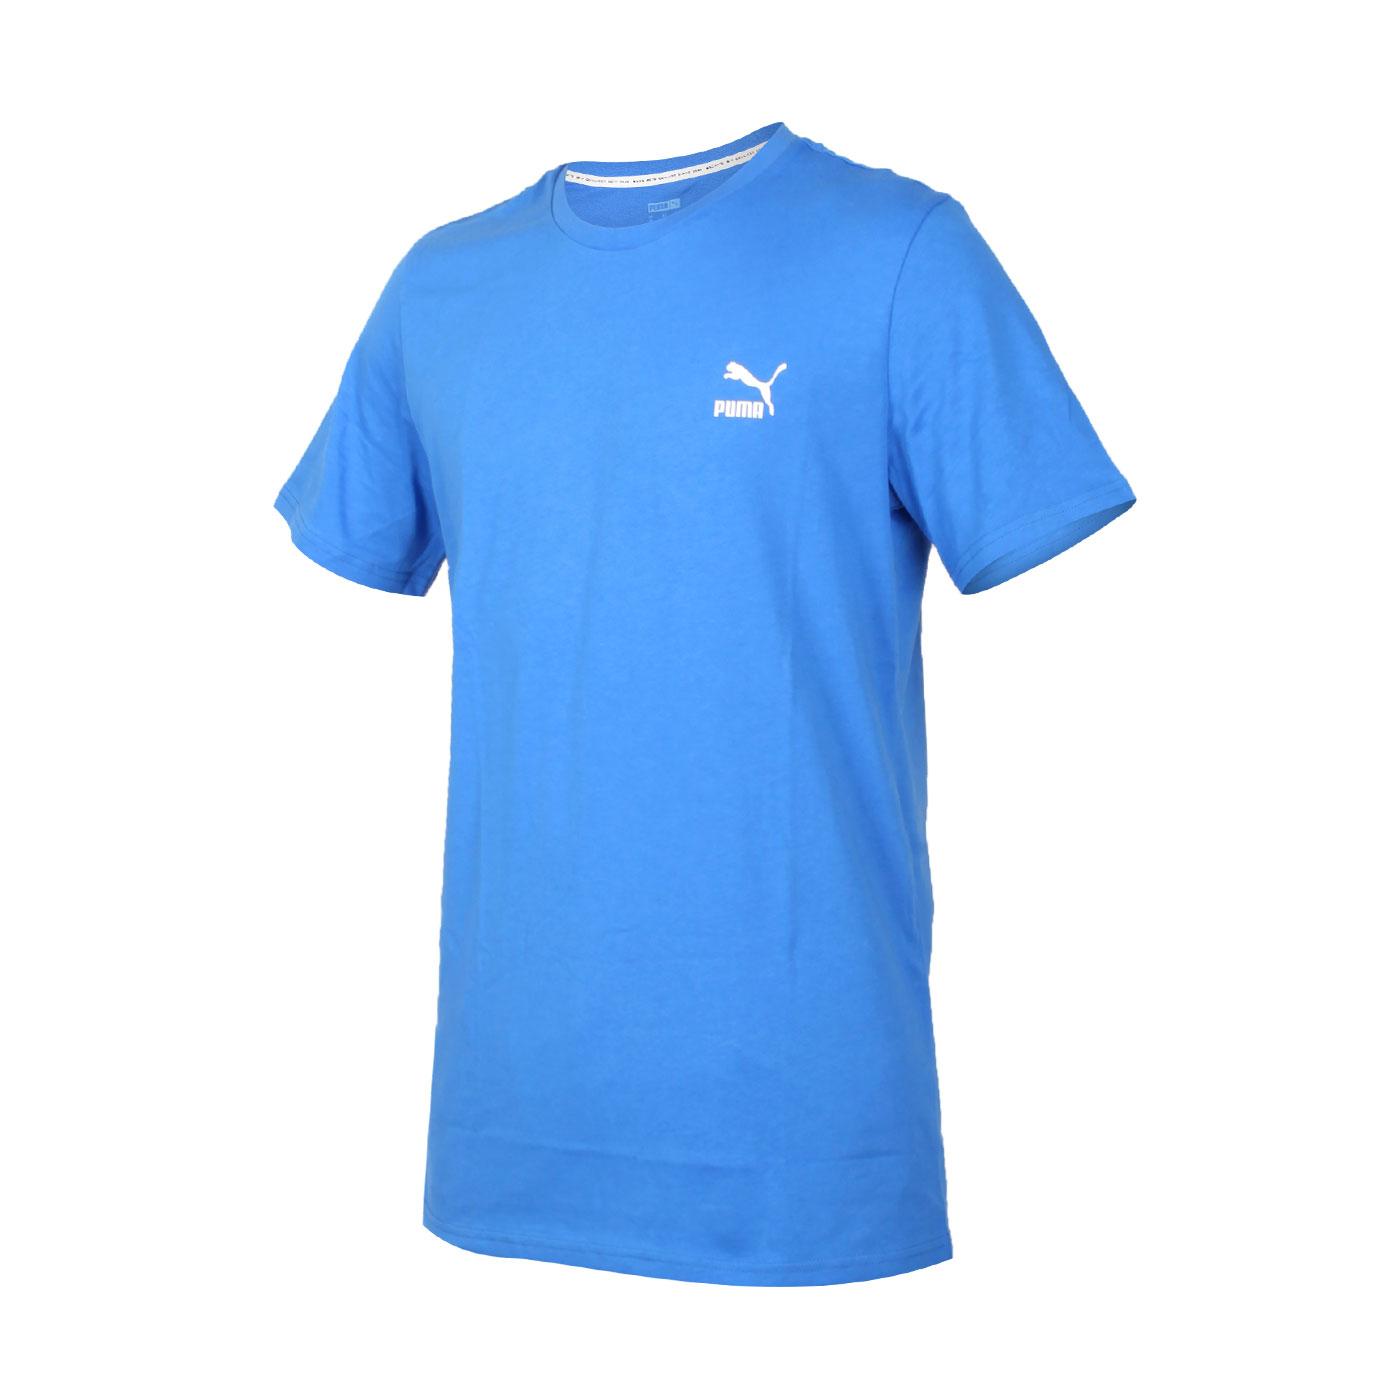 PUMA 男款流行系列短袖T恤 59862741 - 寶藍白紅